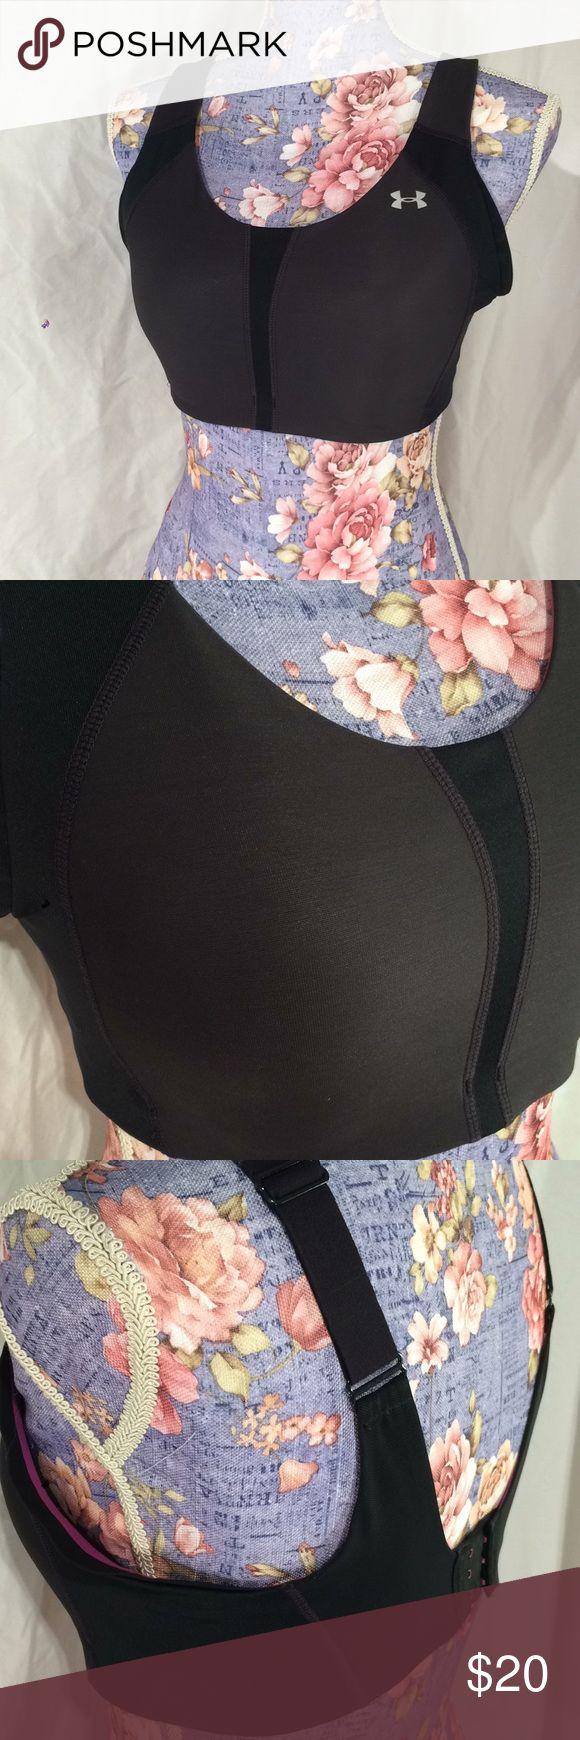 Underarmour armour bra heat gear 34dd Like new!!! Under Armour Intimates & Sleepwear Bras